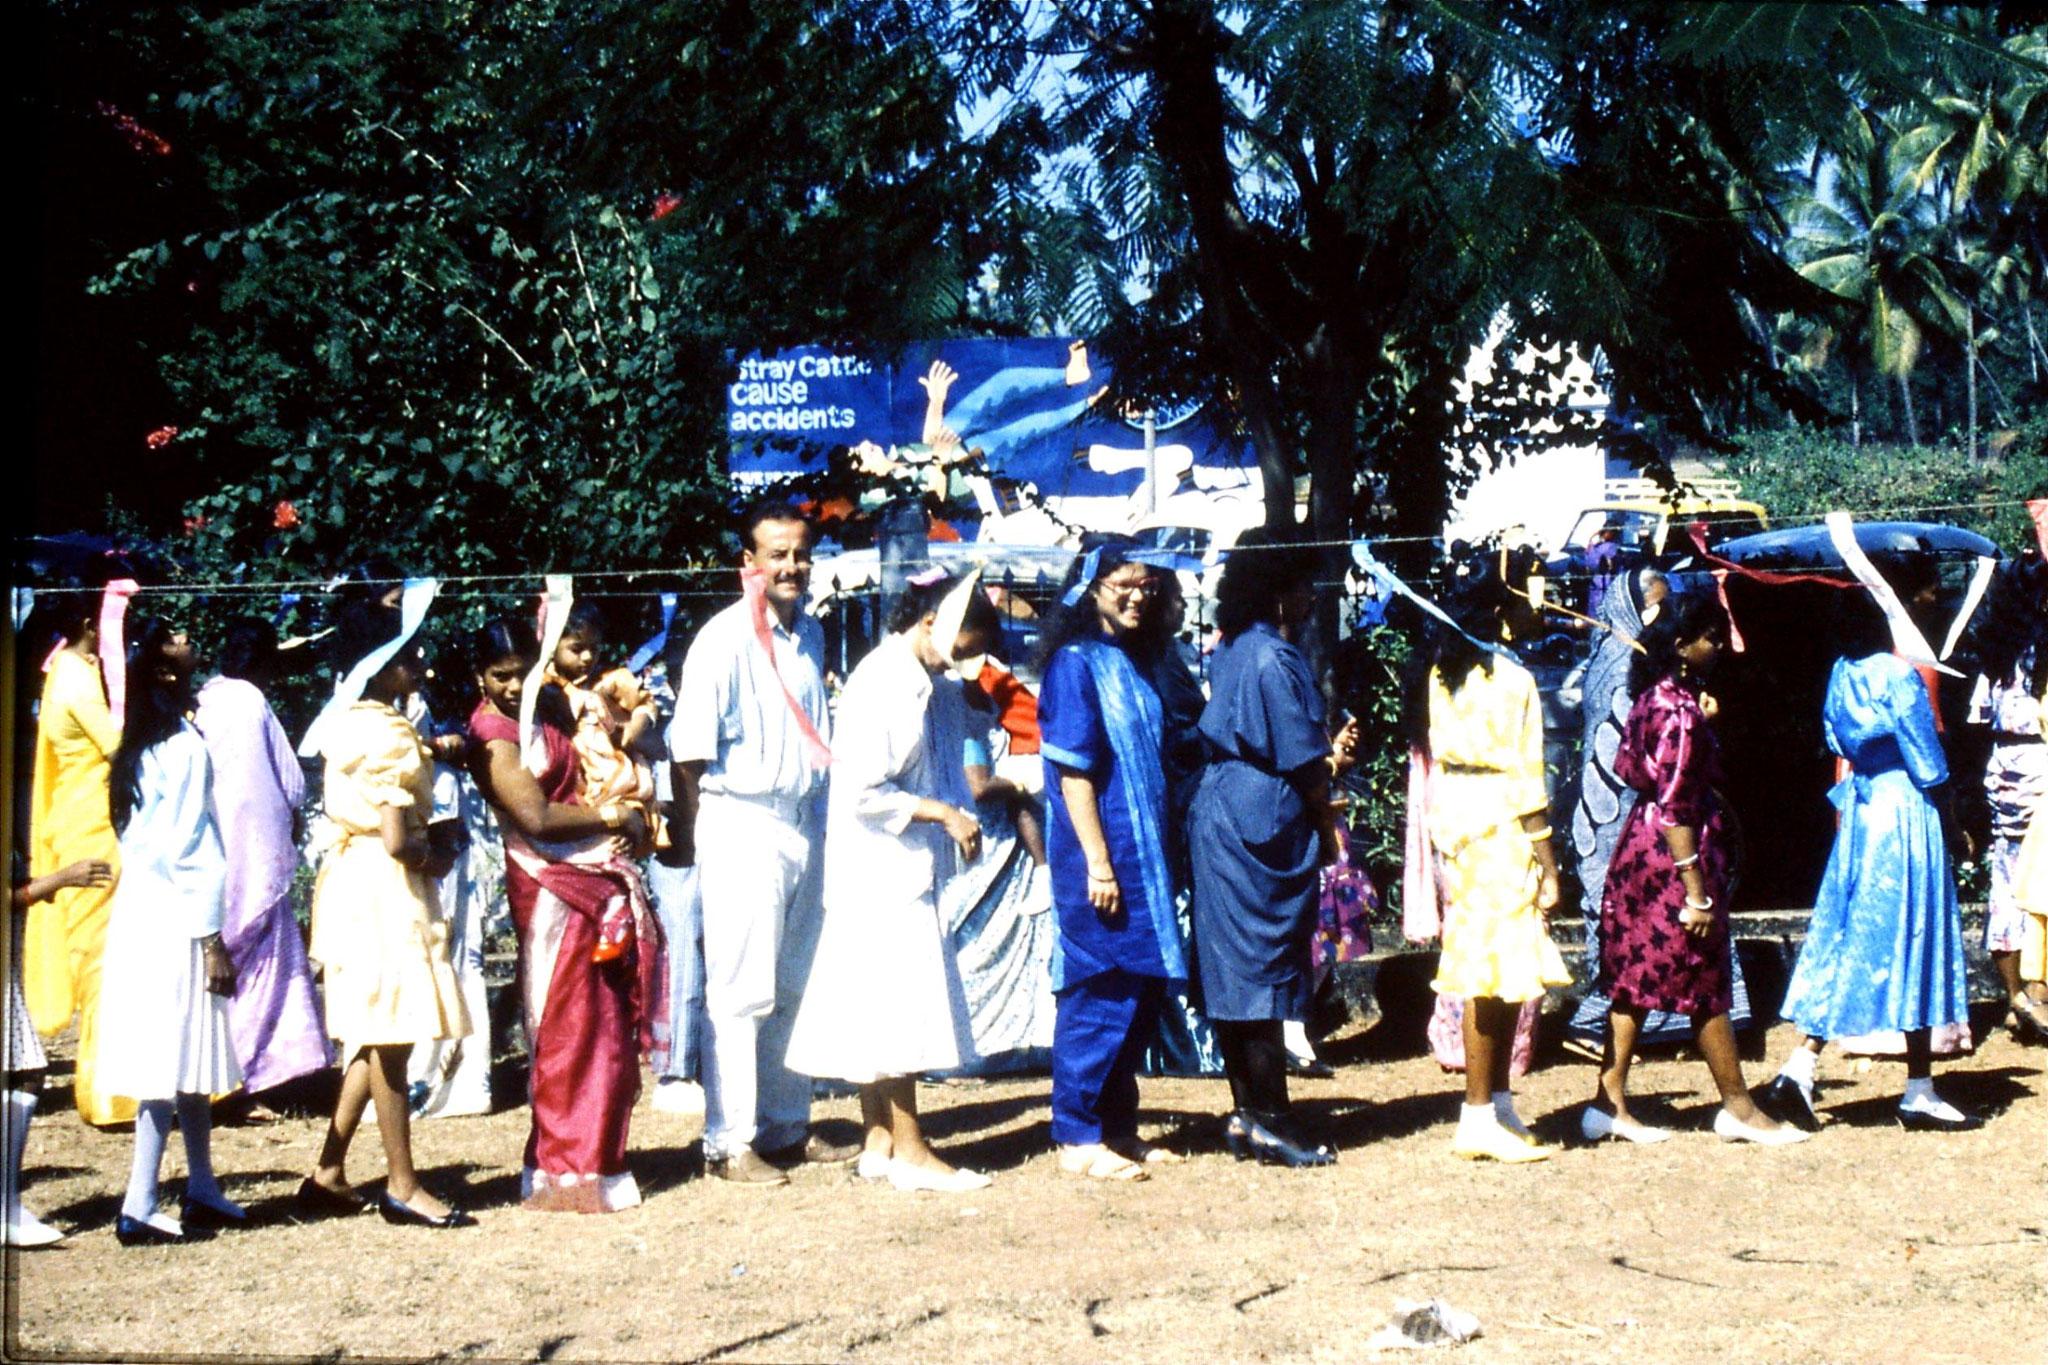 31/12/1989: 14: Siolim church and 10.30 mass procession